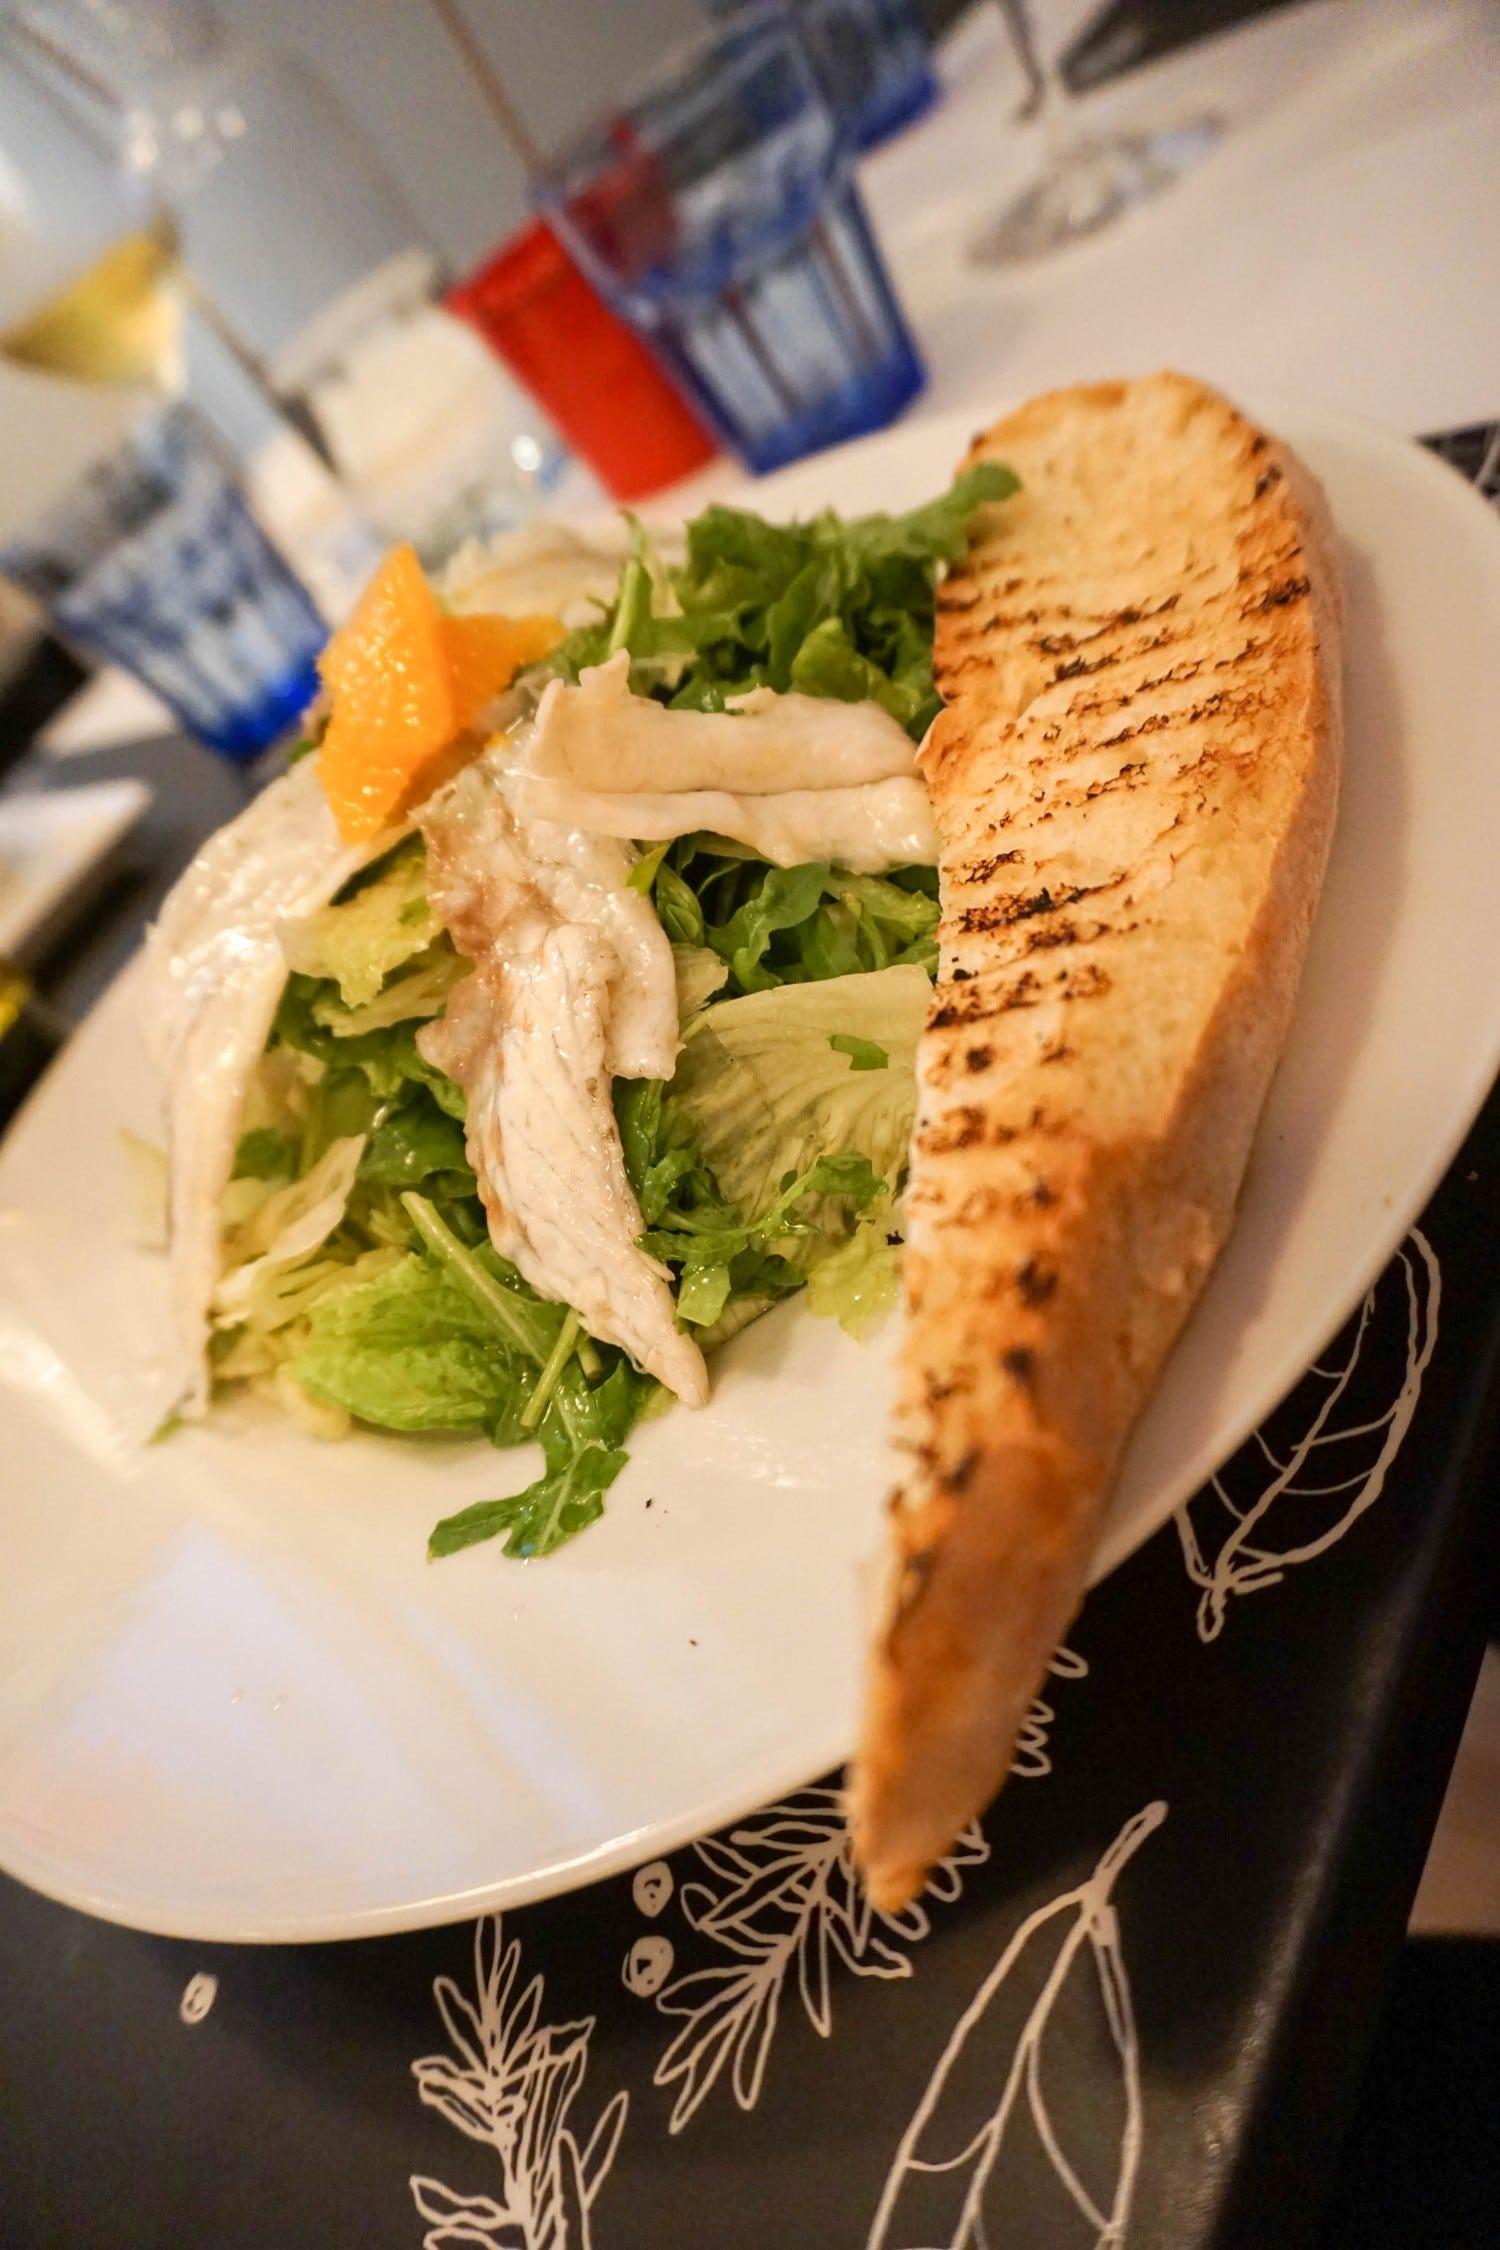 Lari & Penati is a cool spot to eat in Zagreb